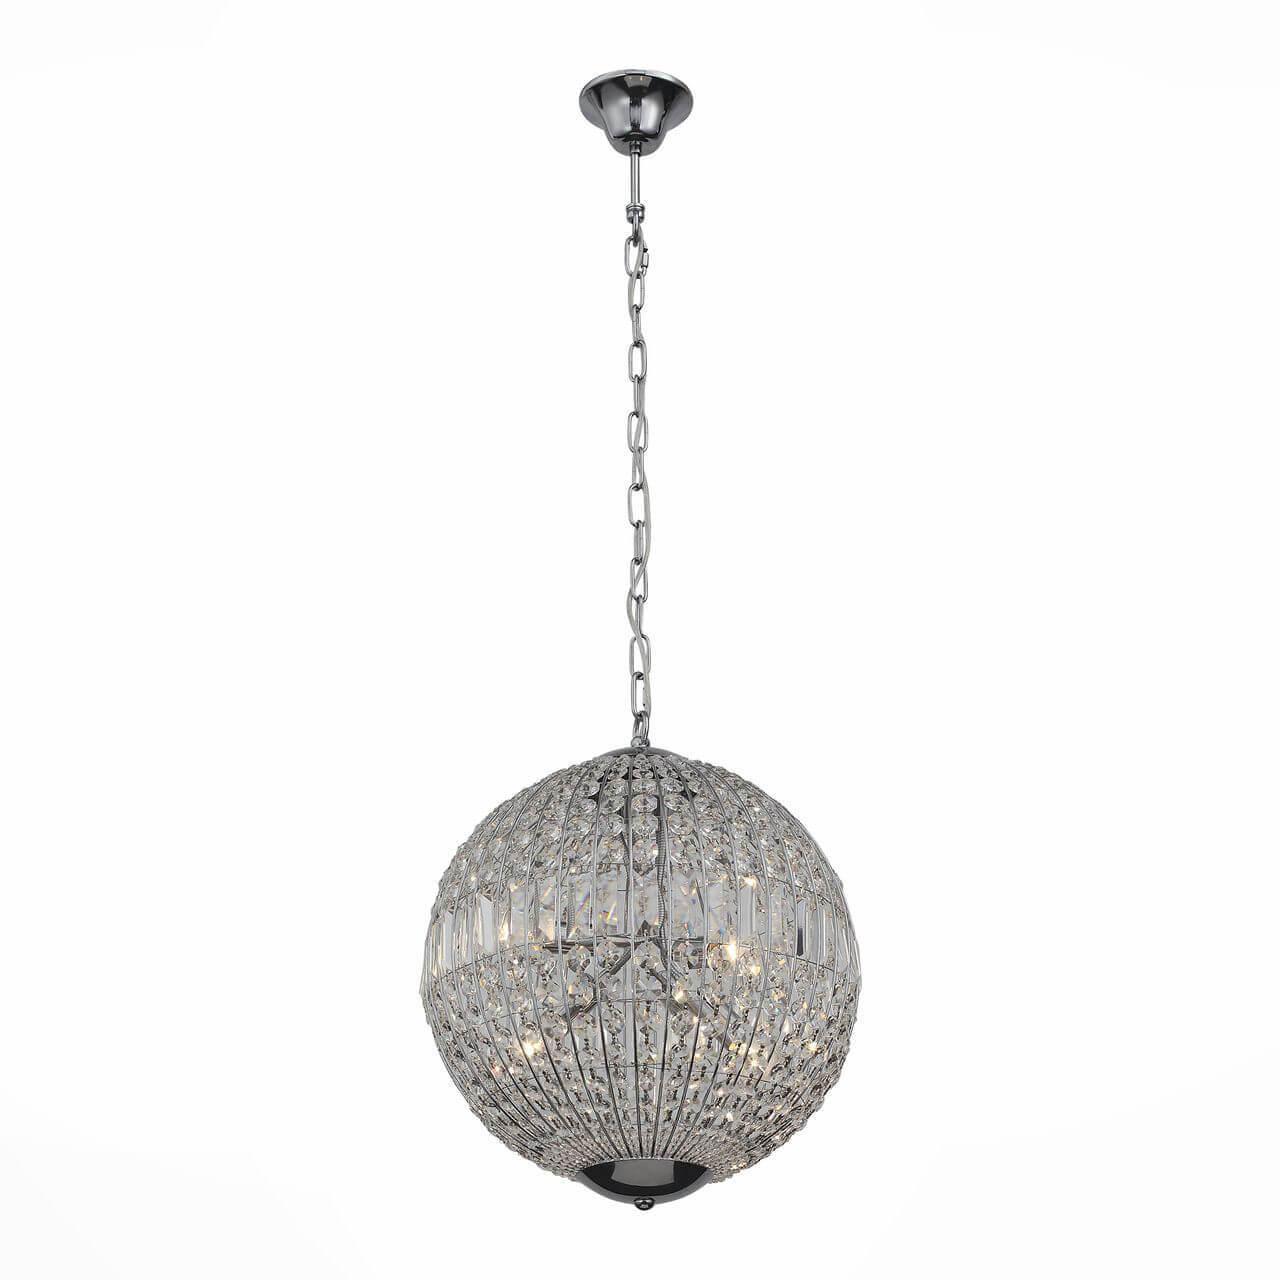 Светильник ST Luce SL226.103.05 Mondo цена 2017